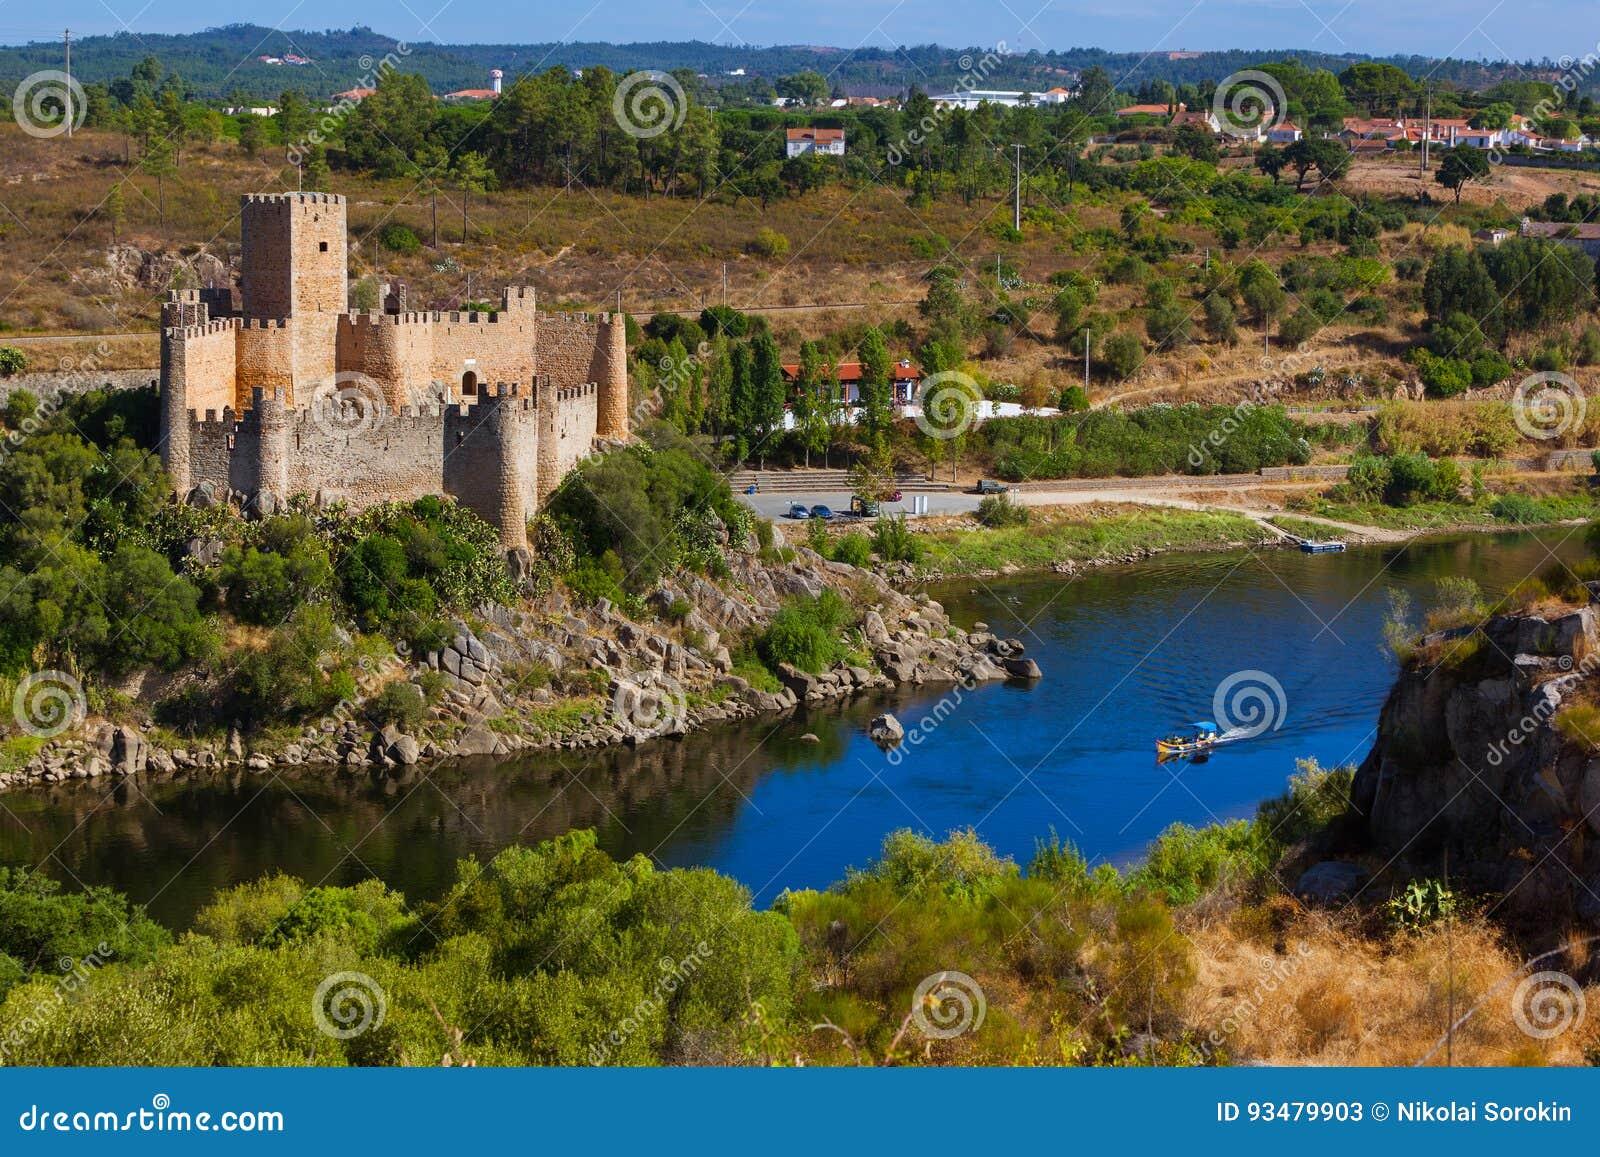 Castillo De Almourol Portugal Imagen De Archivo Imagen De Castillo Europa 93479903